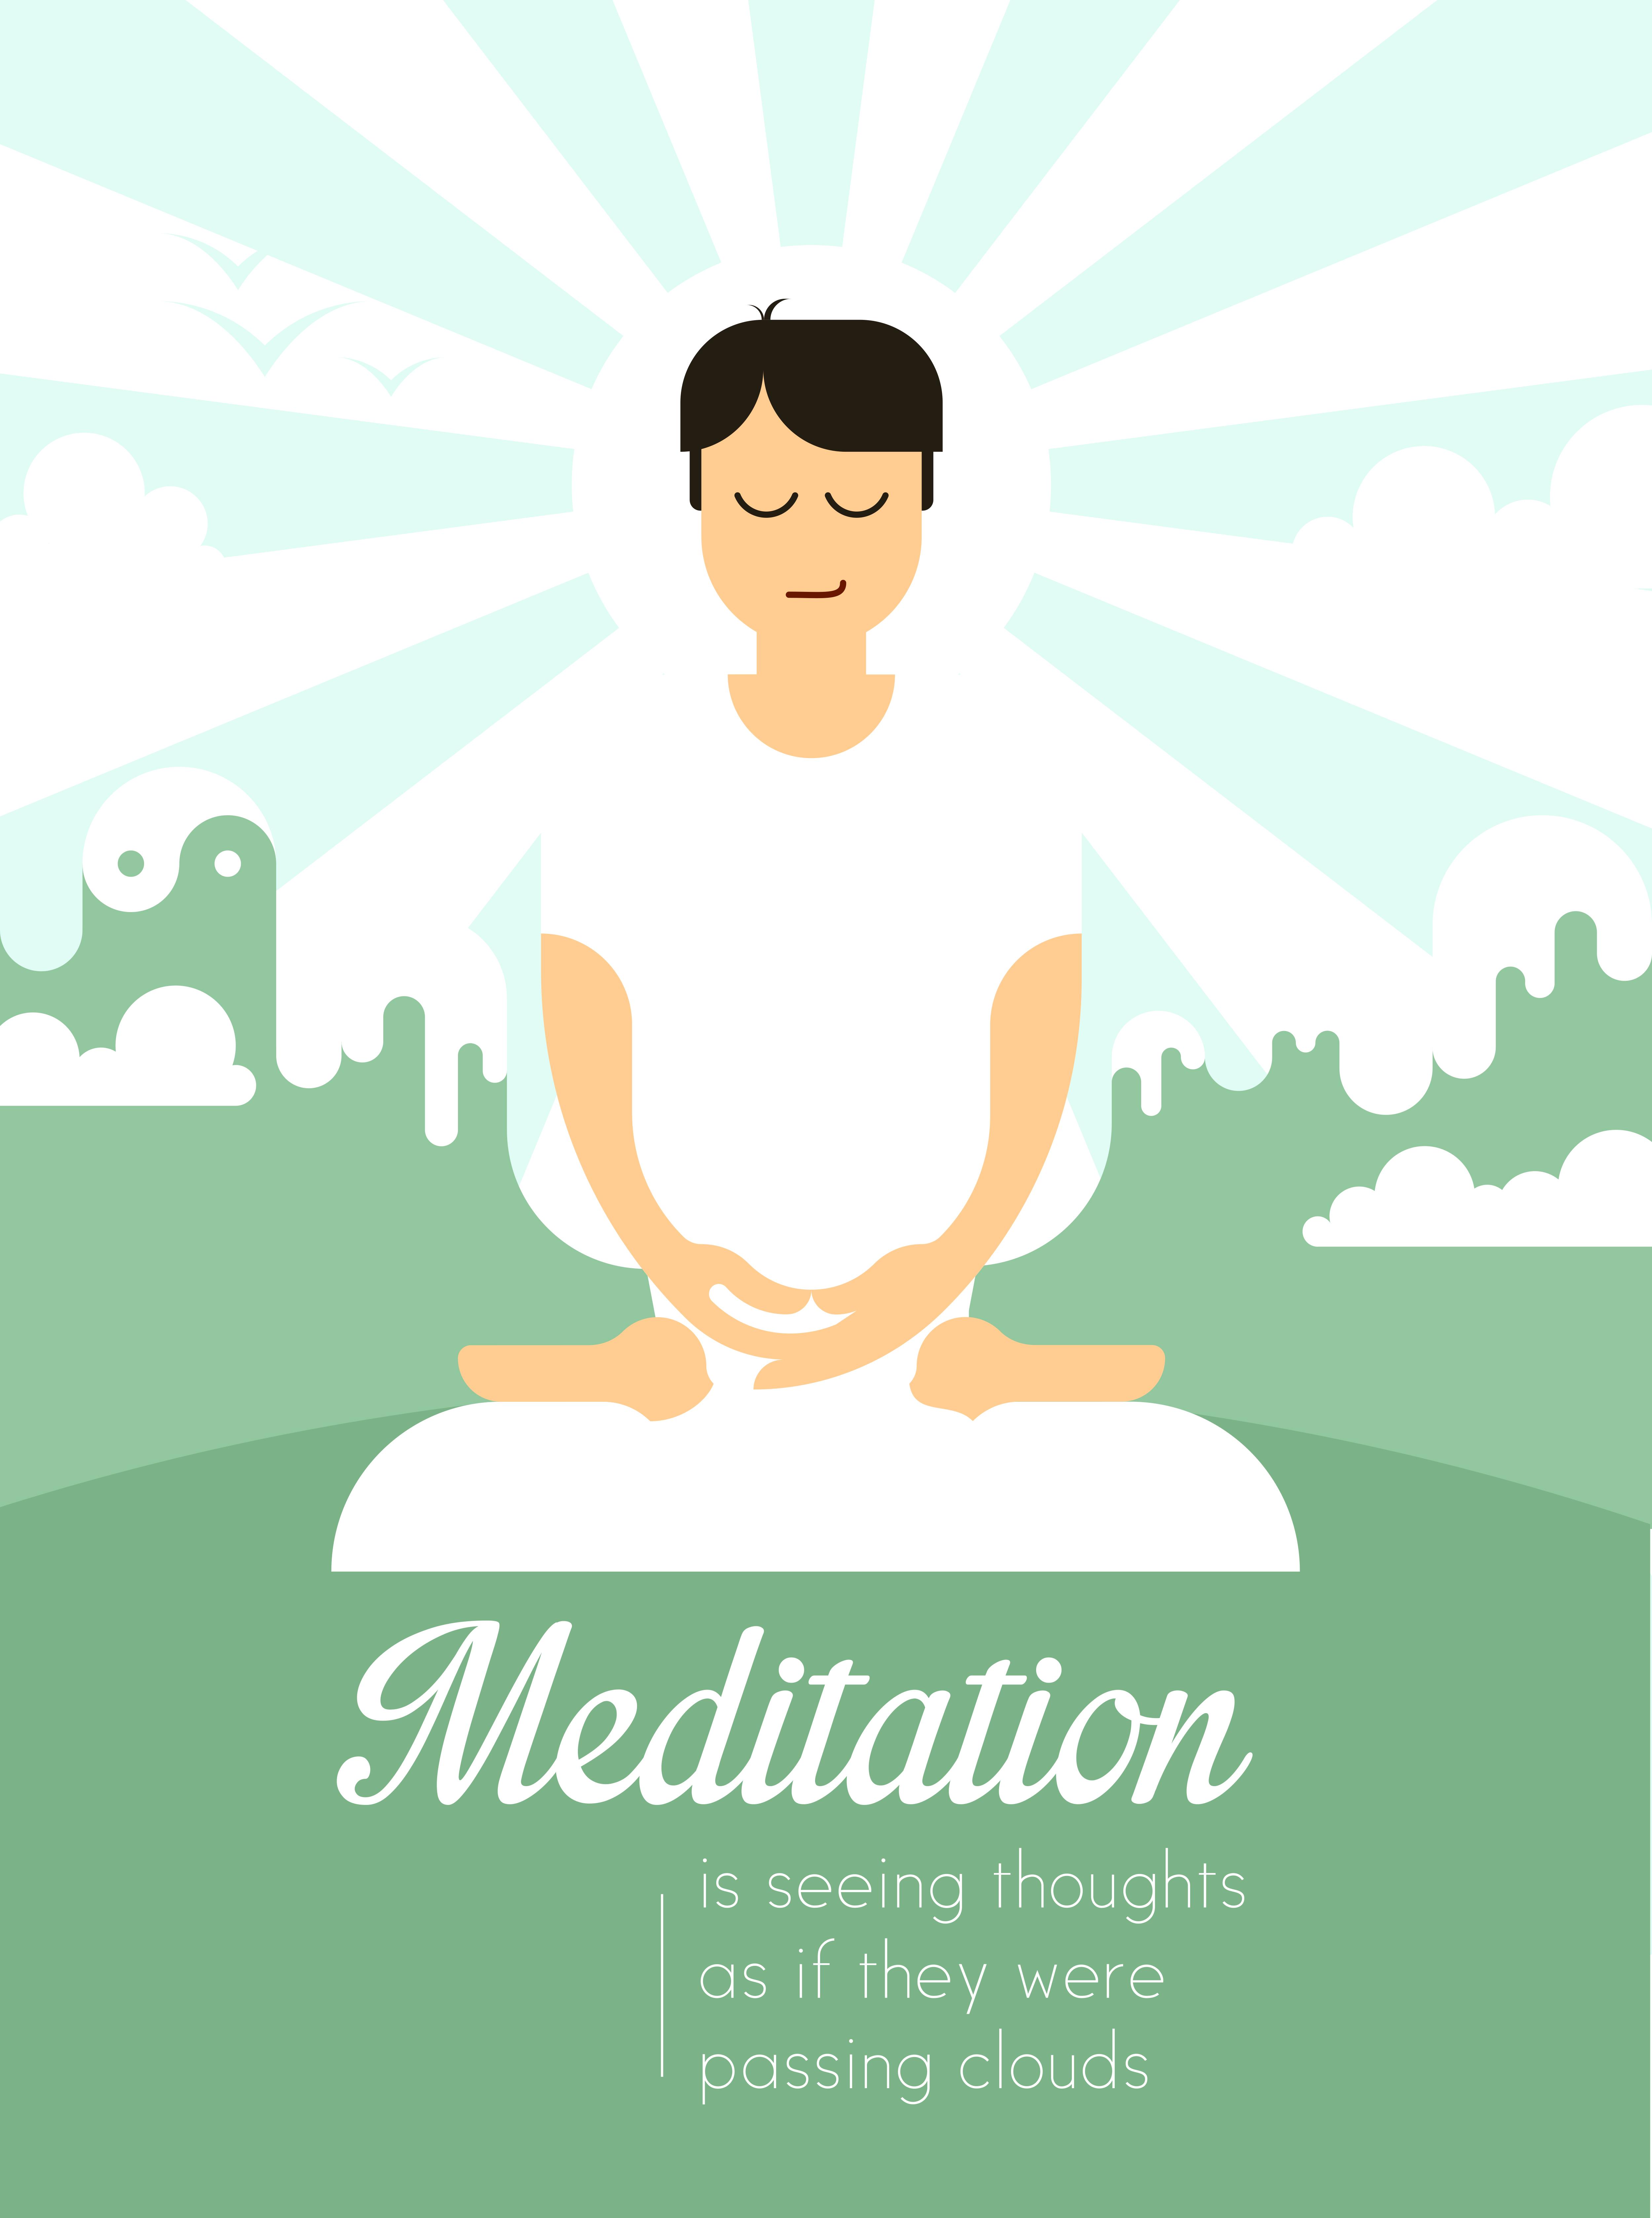 Meditation_by_Victor_Tongdee.jpg